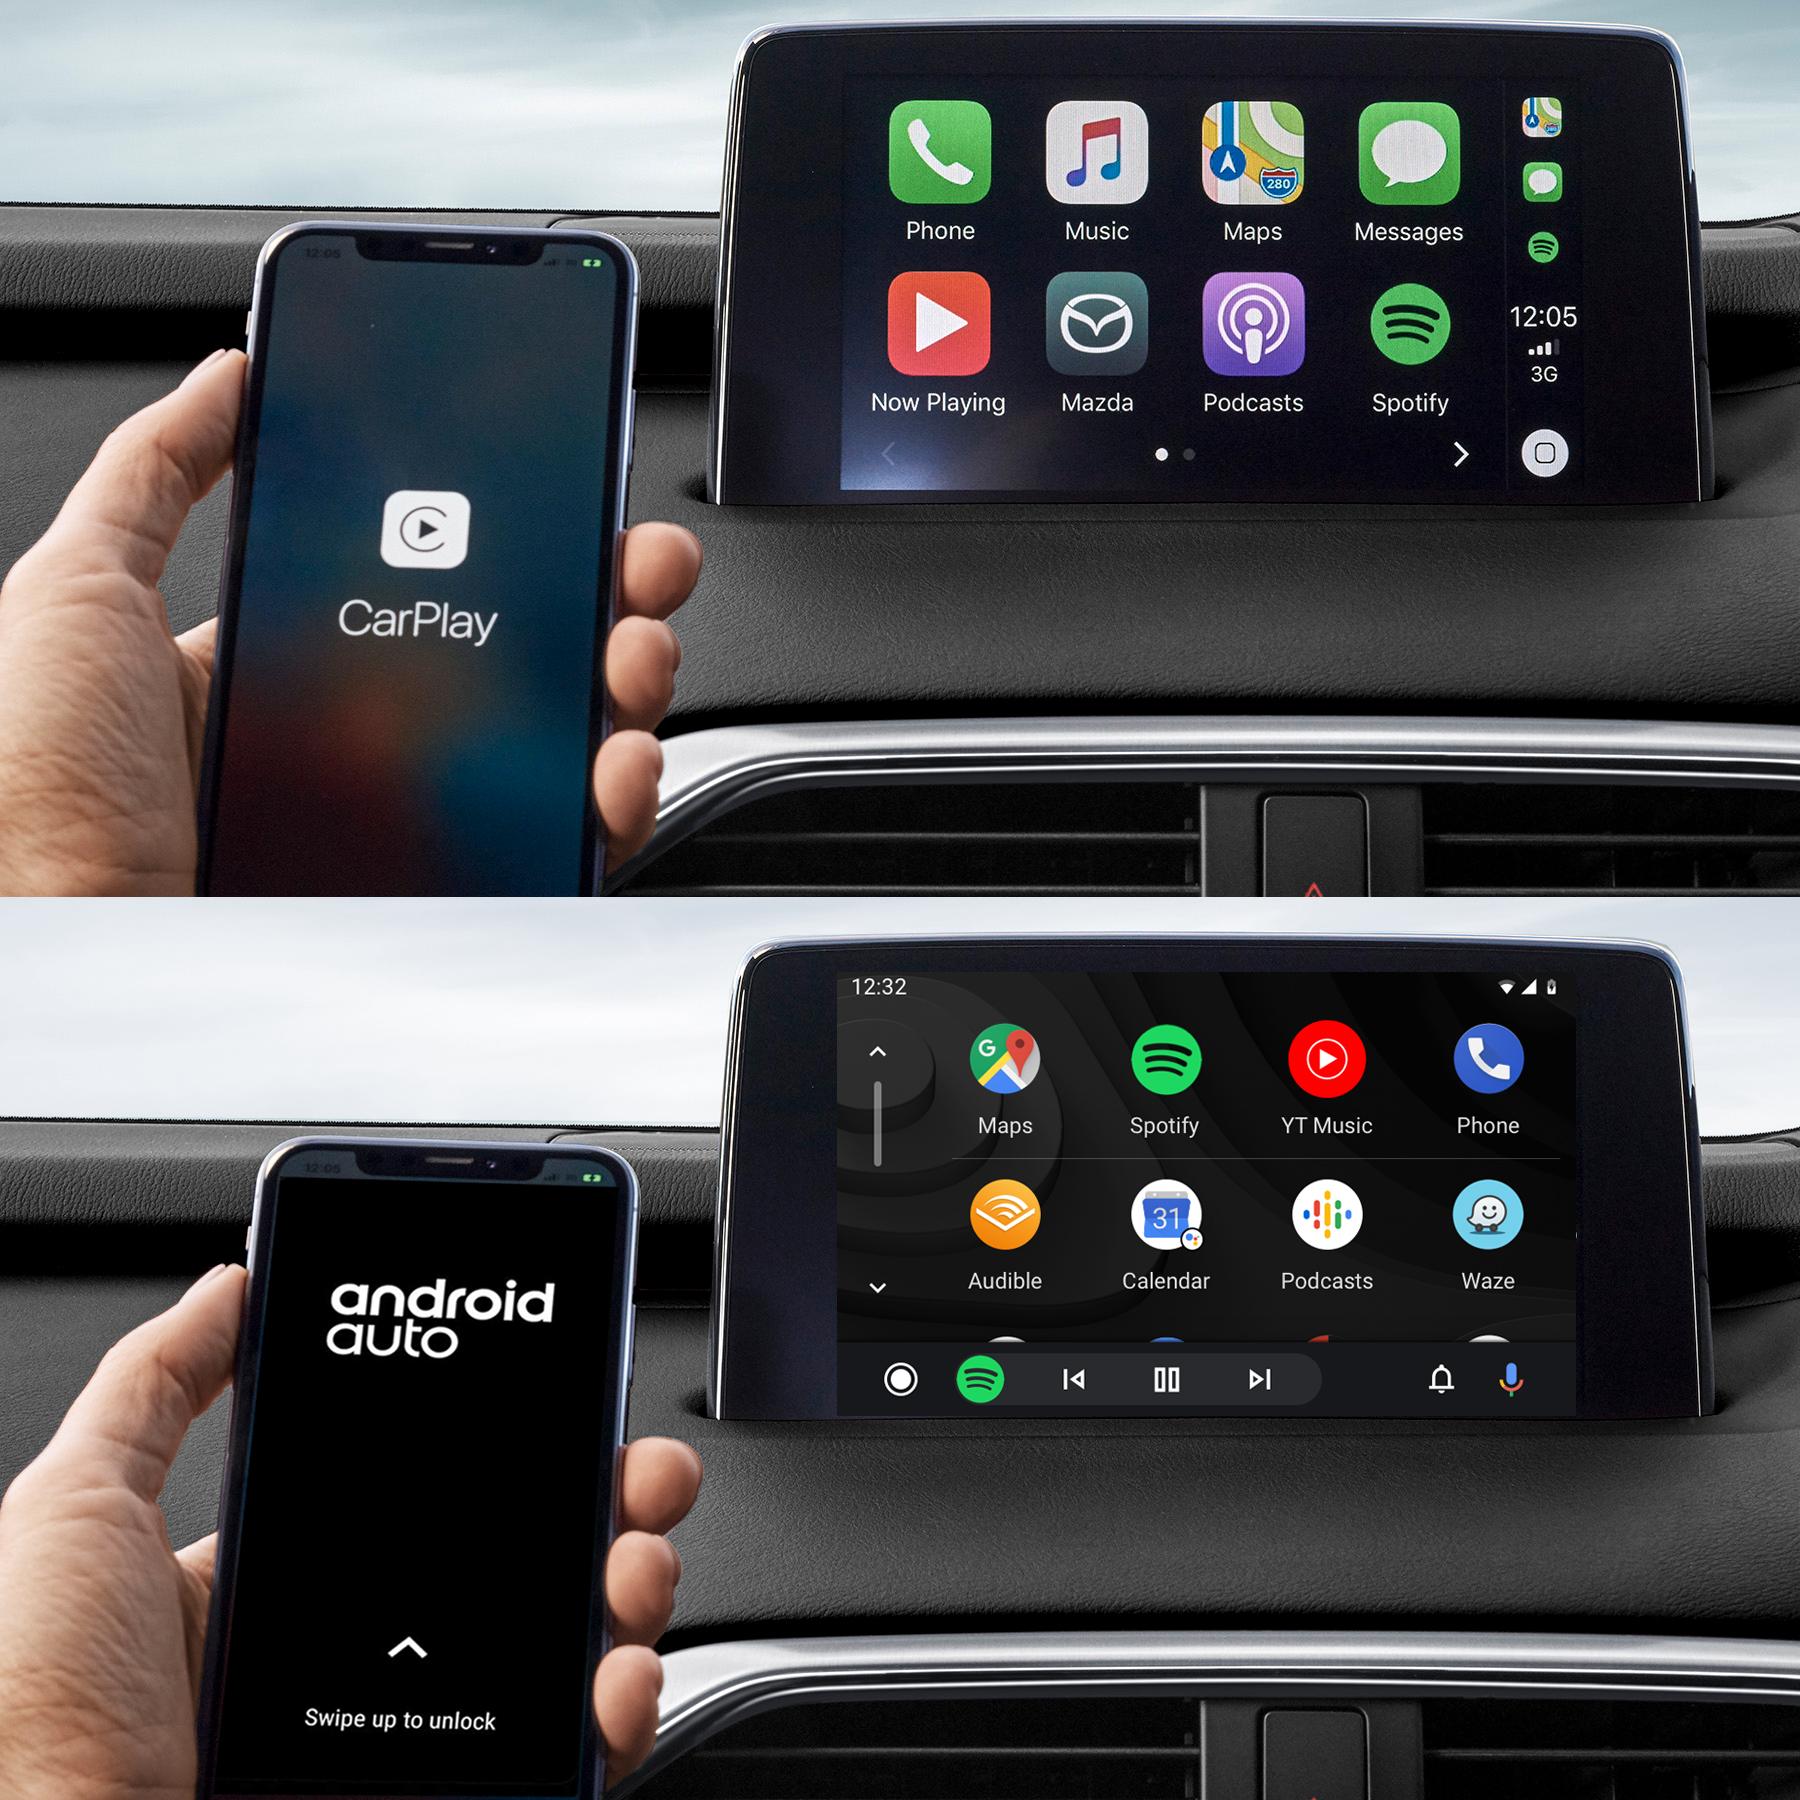 Kelebihan Android Auto Mazda 3 Tangguh